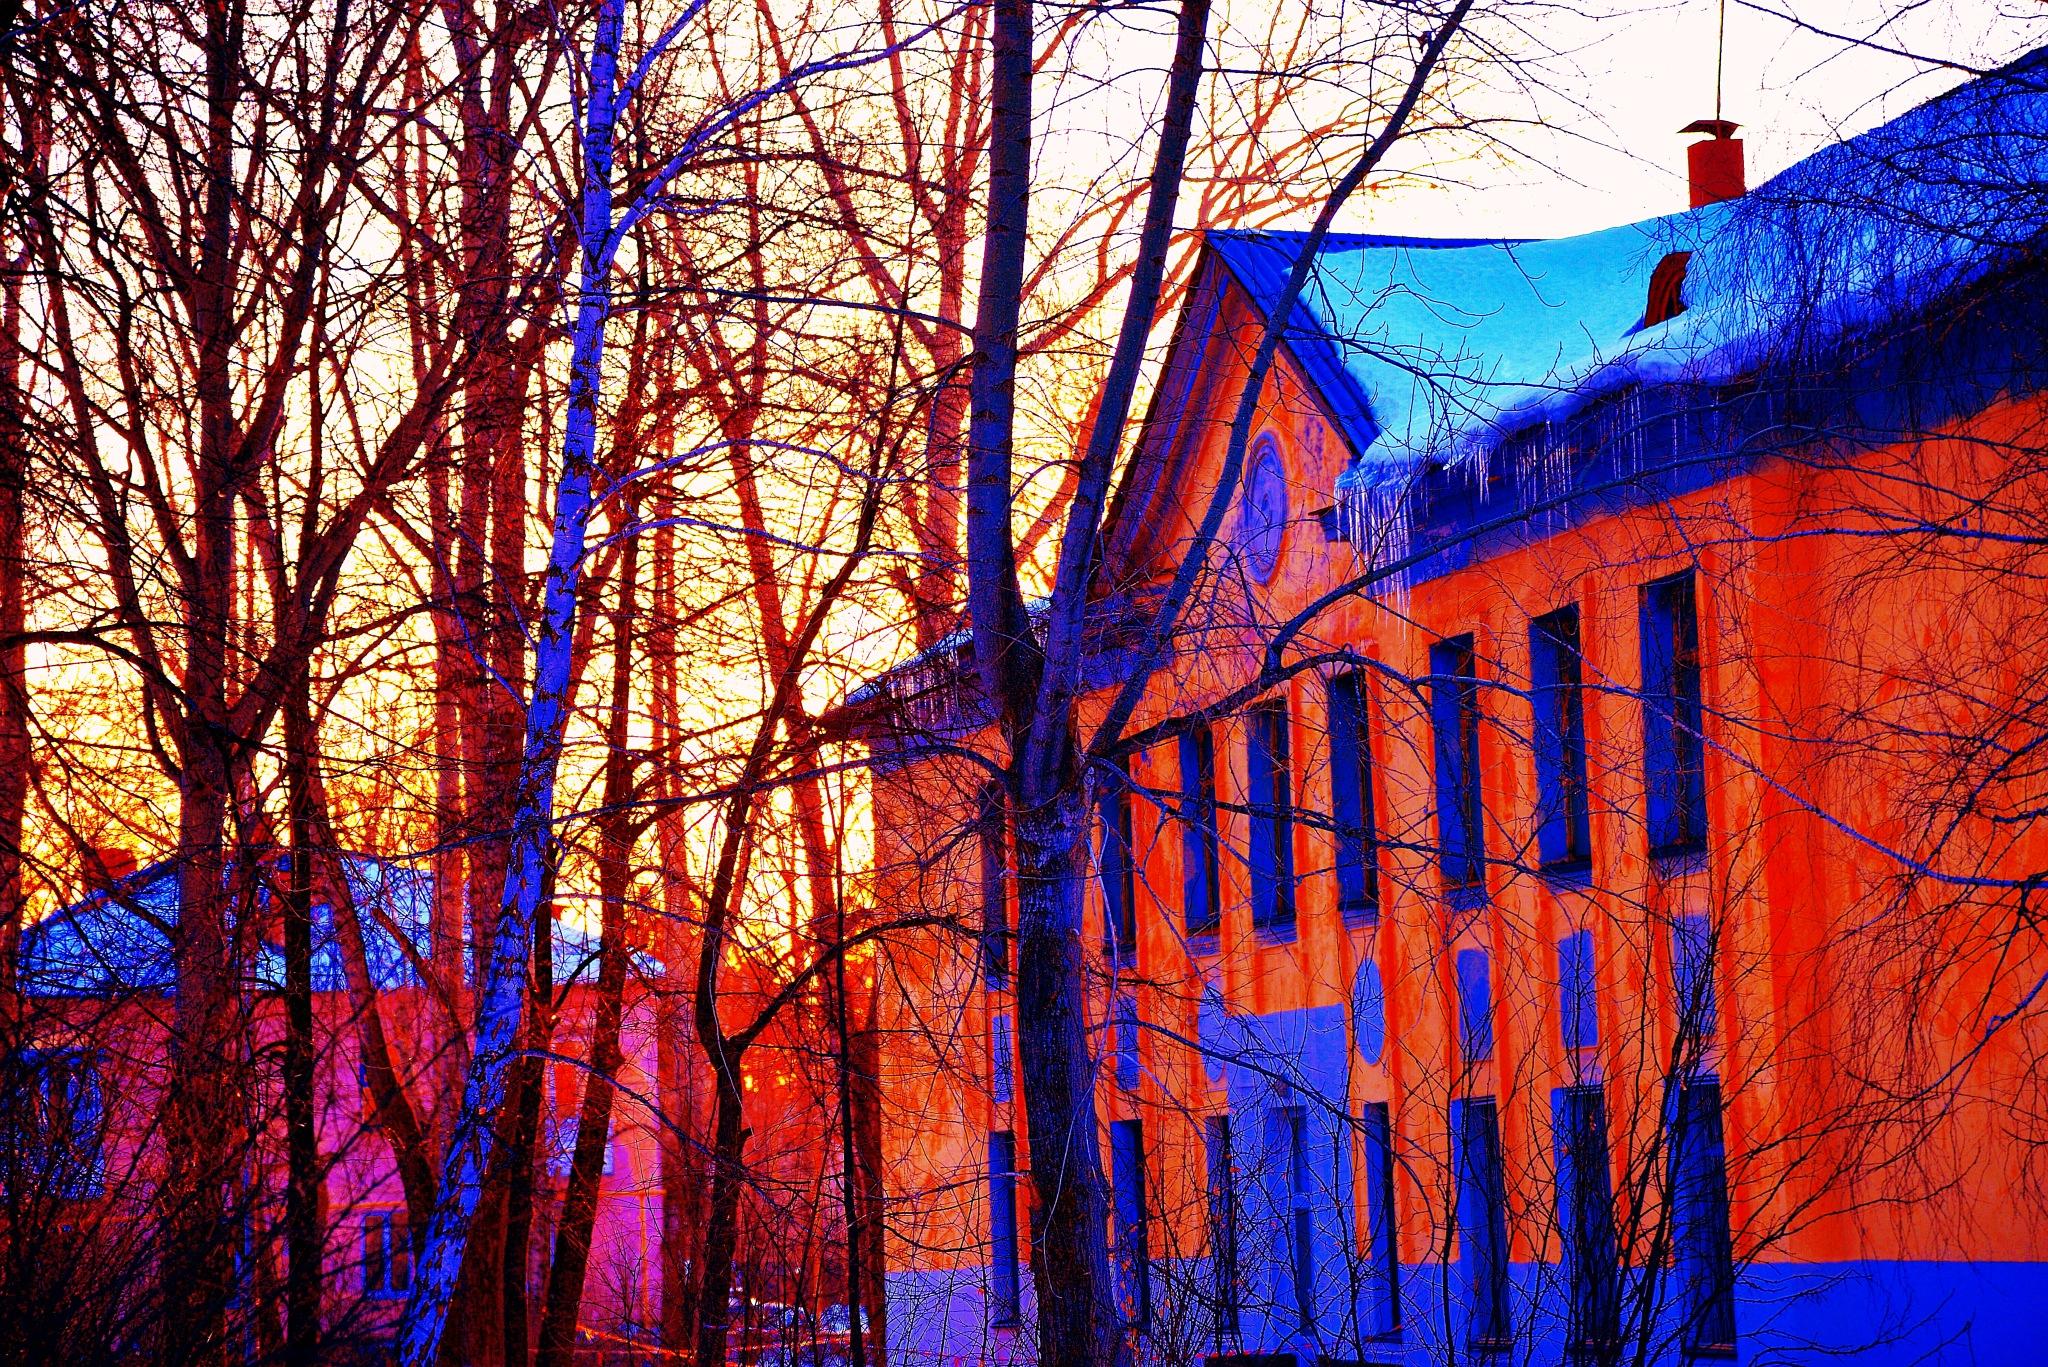 Melodies of Trees by sergey.parfeniuk